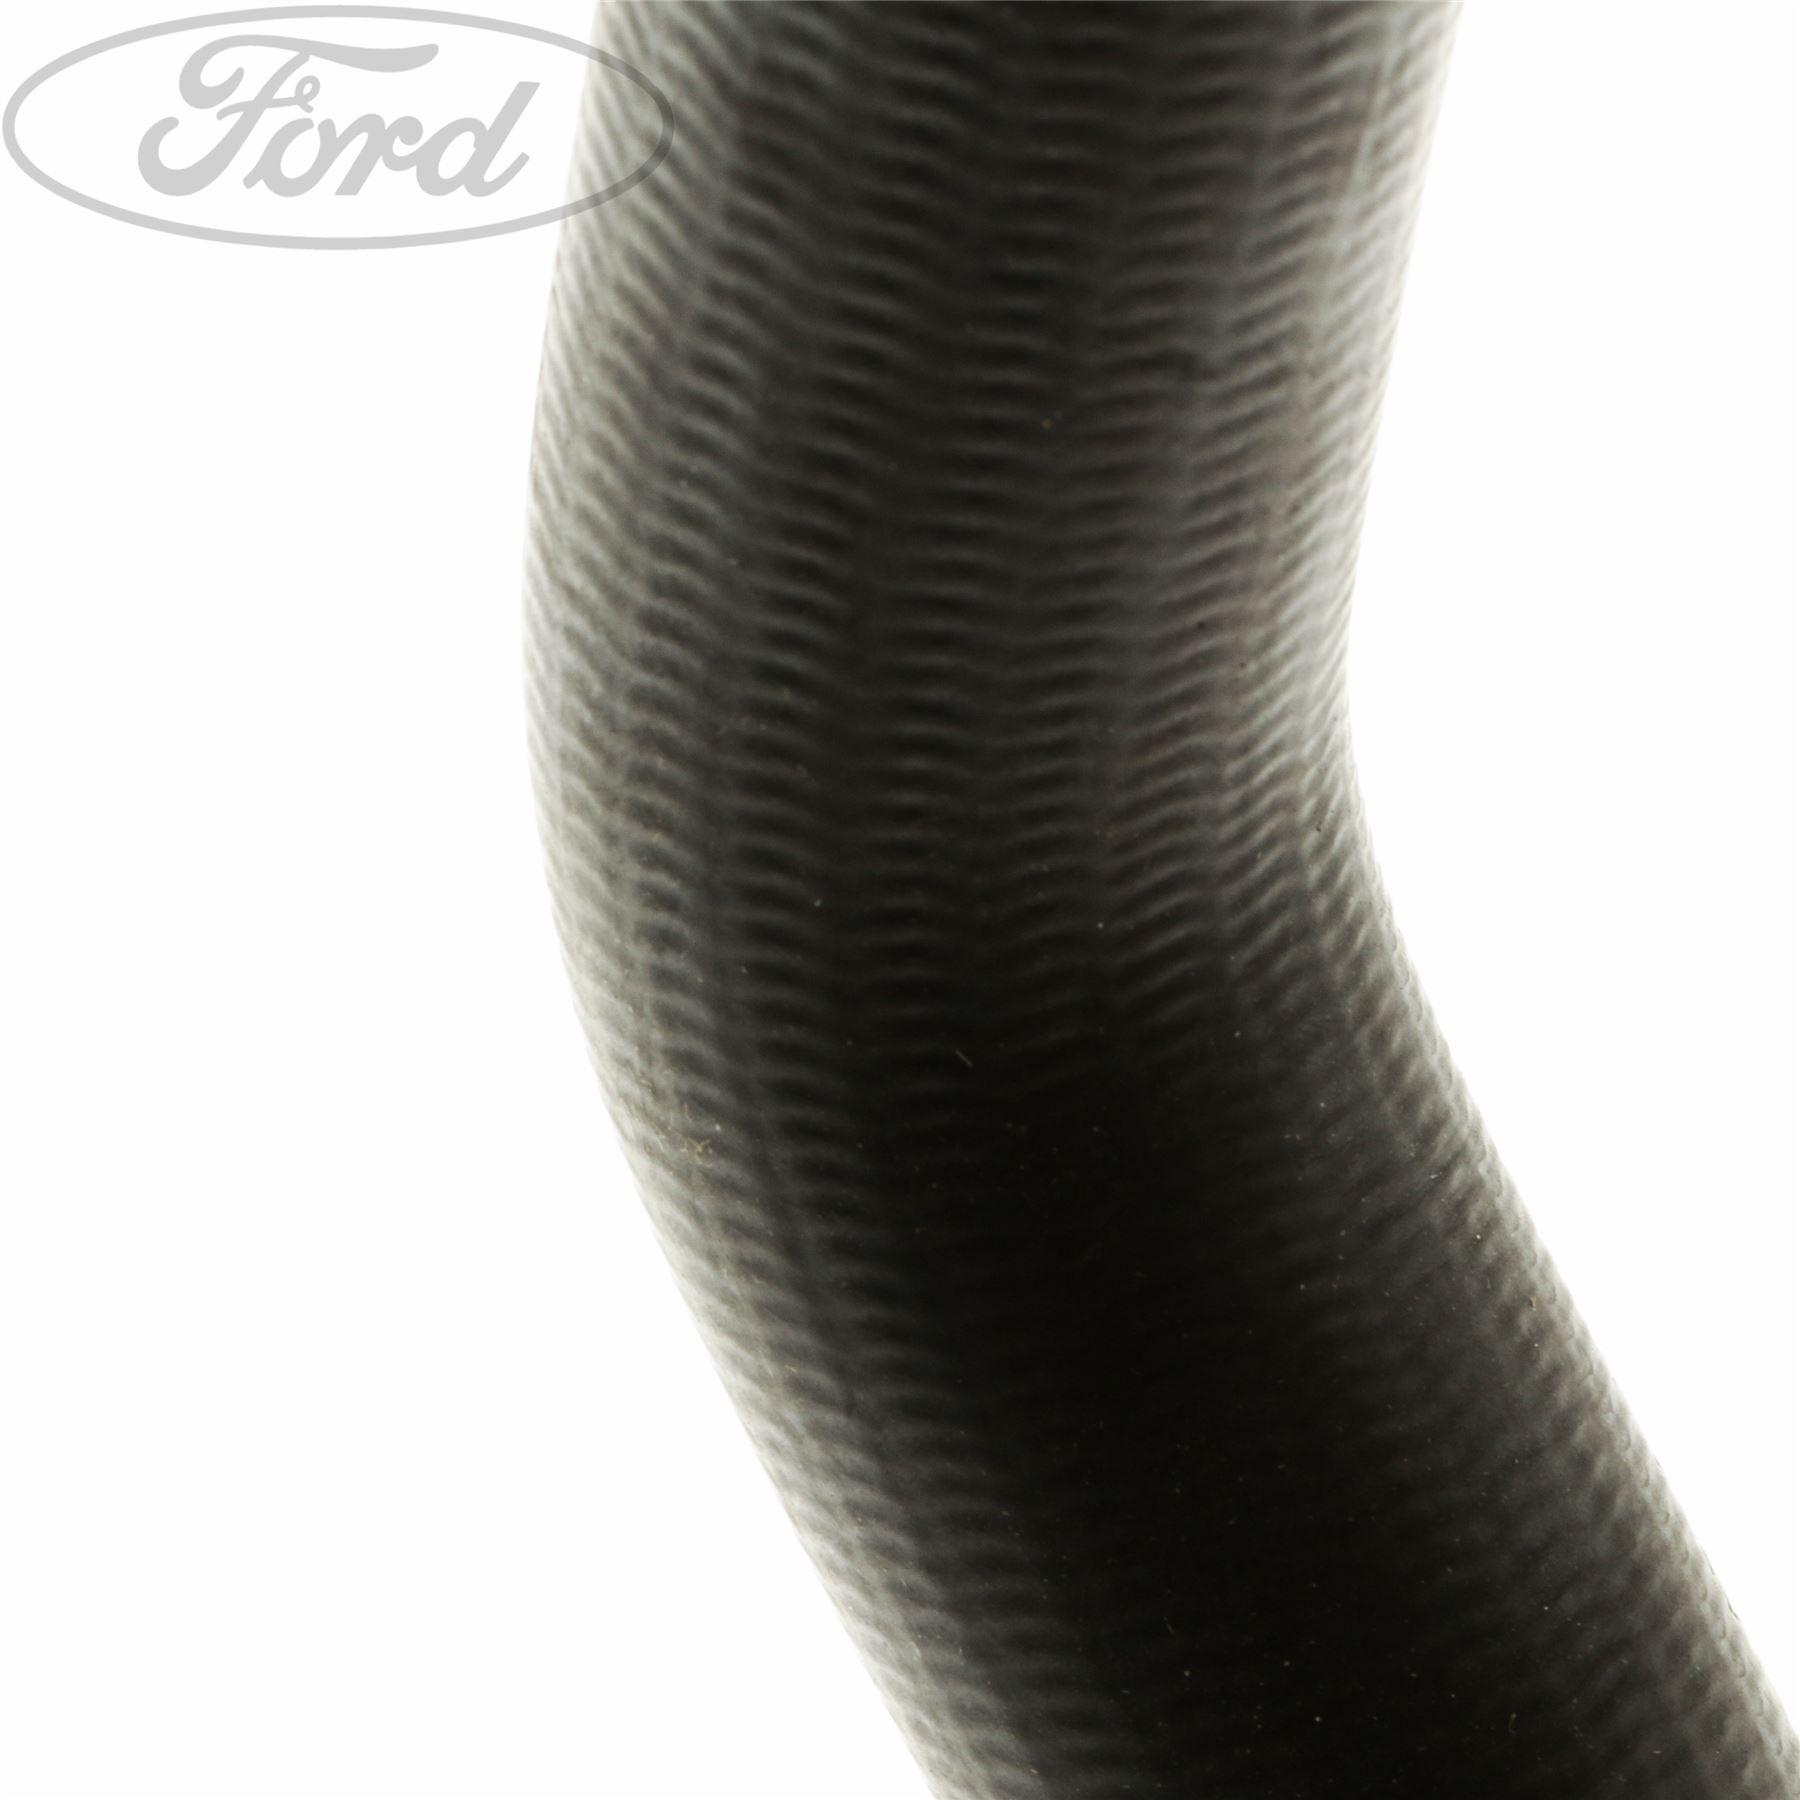 Genuine Ford Cooling System Hose